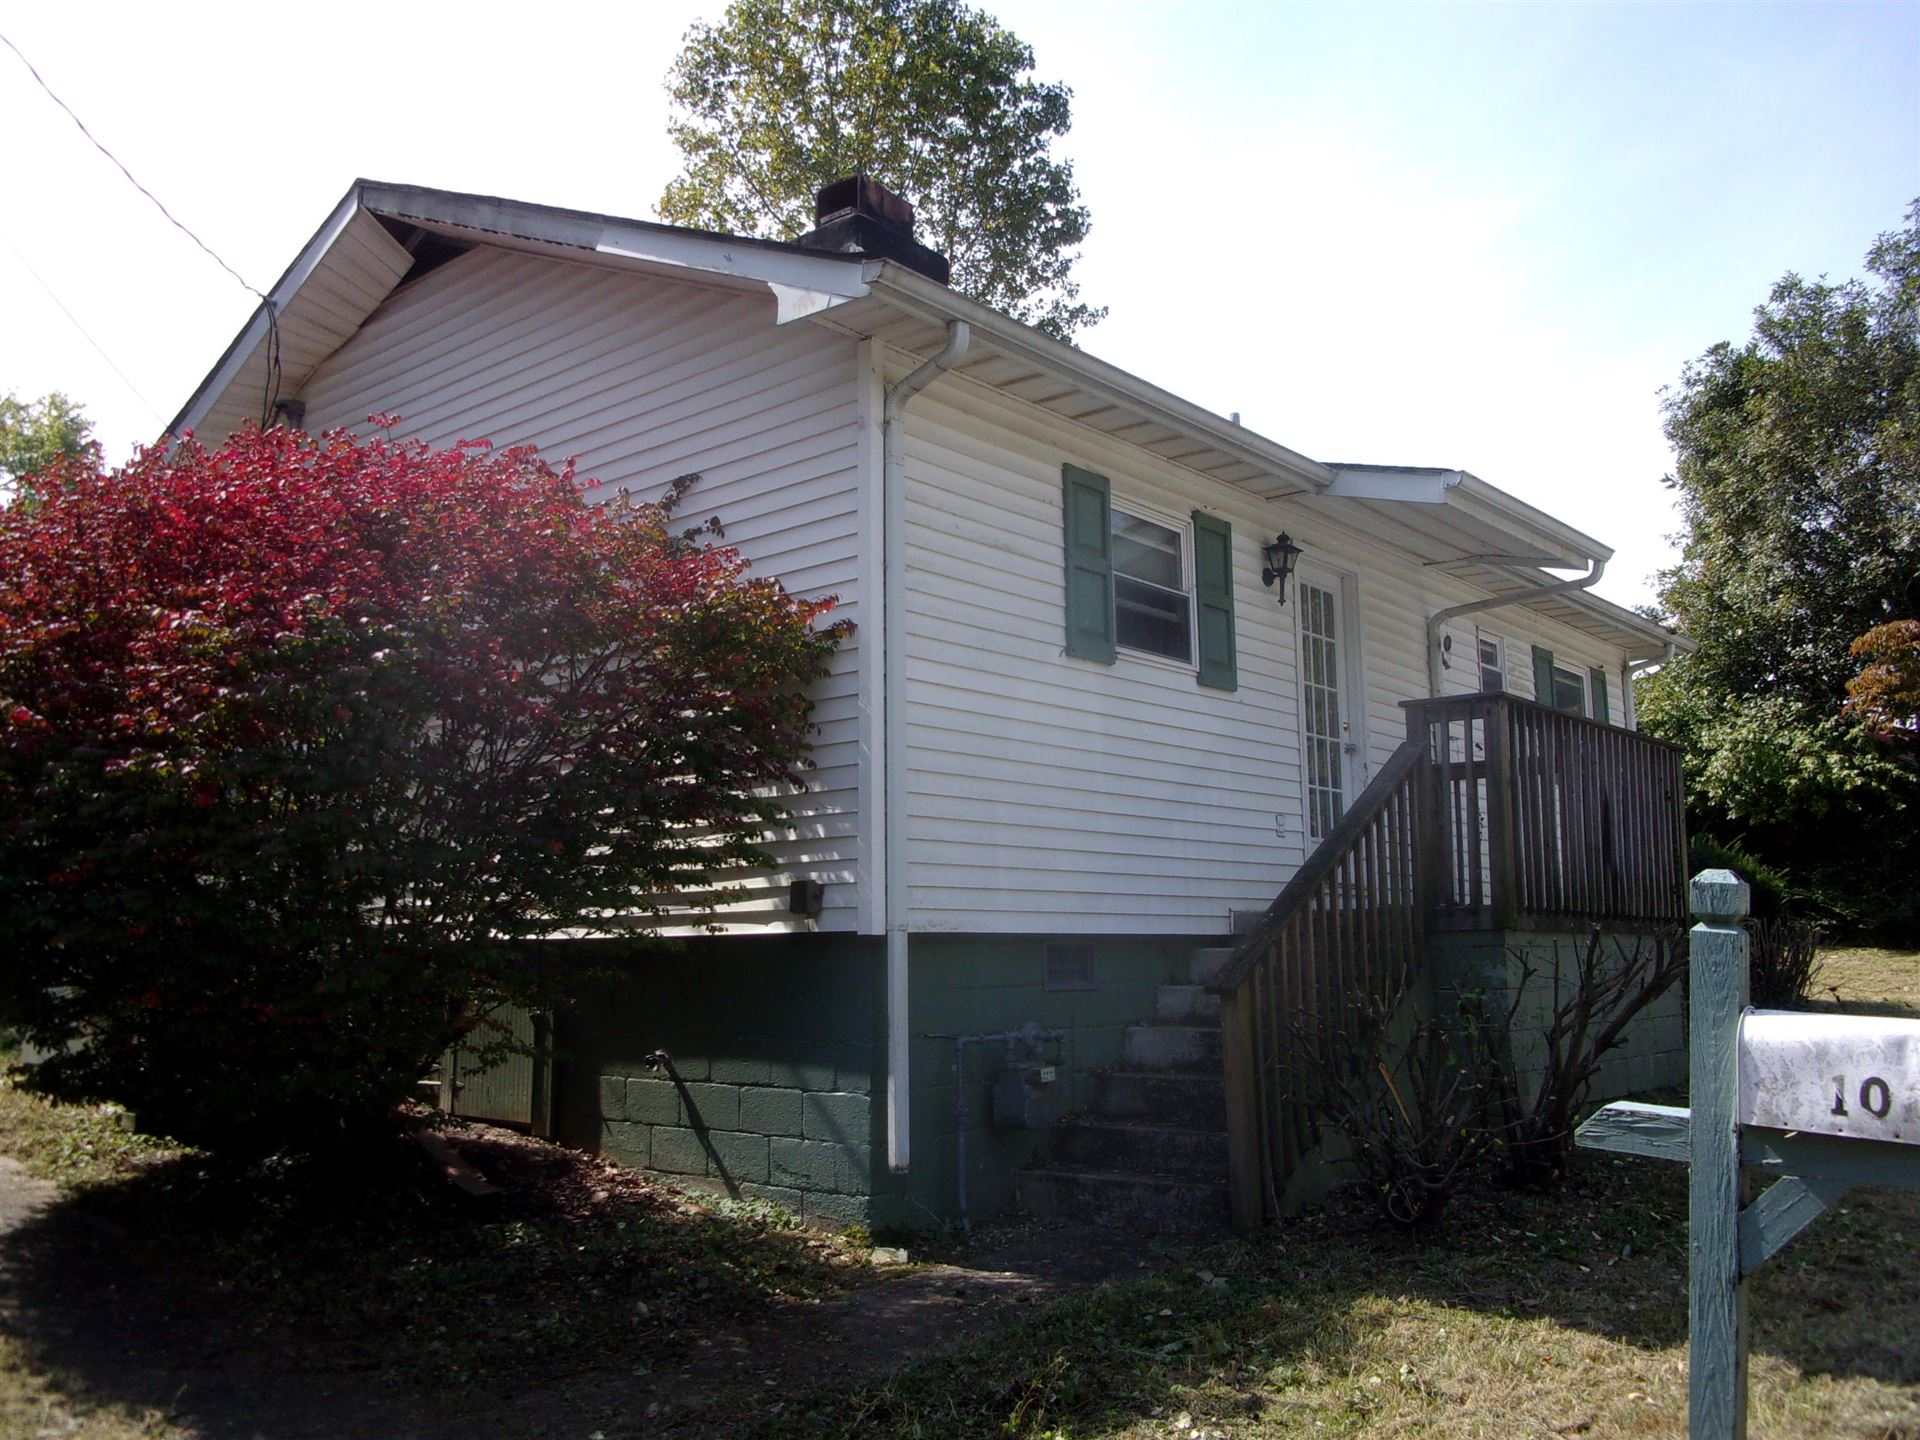 Photo of 102 Marion Rd, Oak Ridge, TN 37830 (MLS # 1132832)